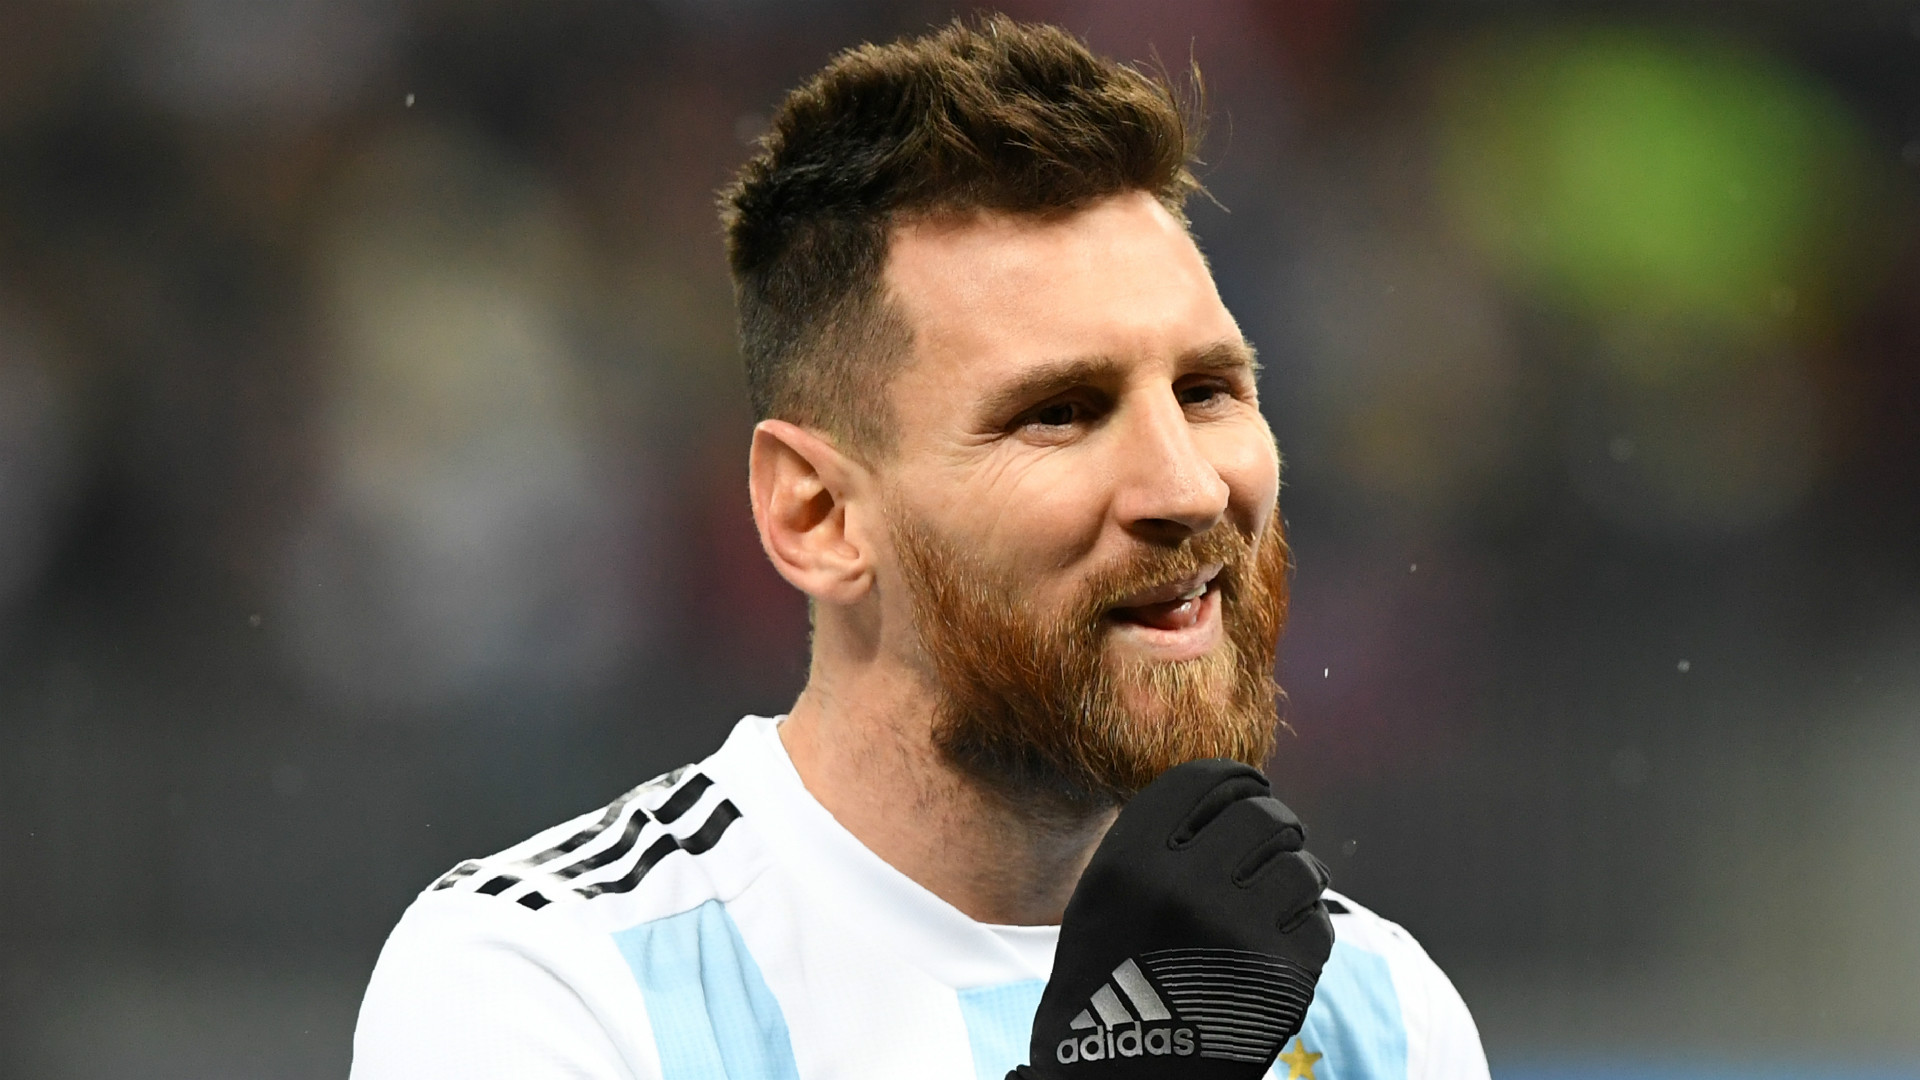 Prochain article Article précédent Pin Messi juge la France. GoalWhatsappTwitterFacebookCommentaires 0